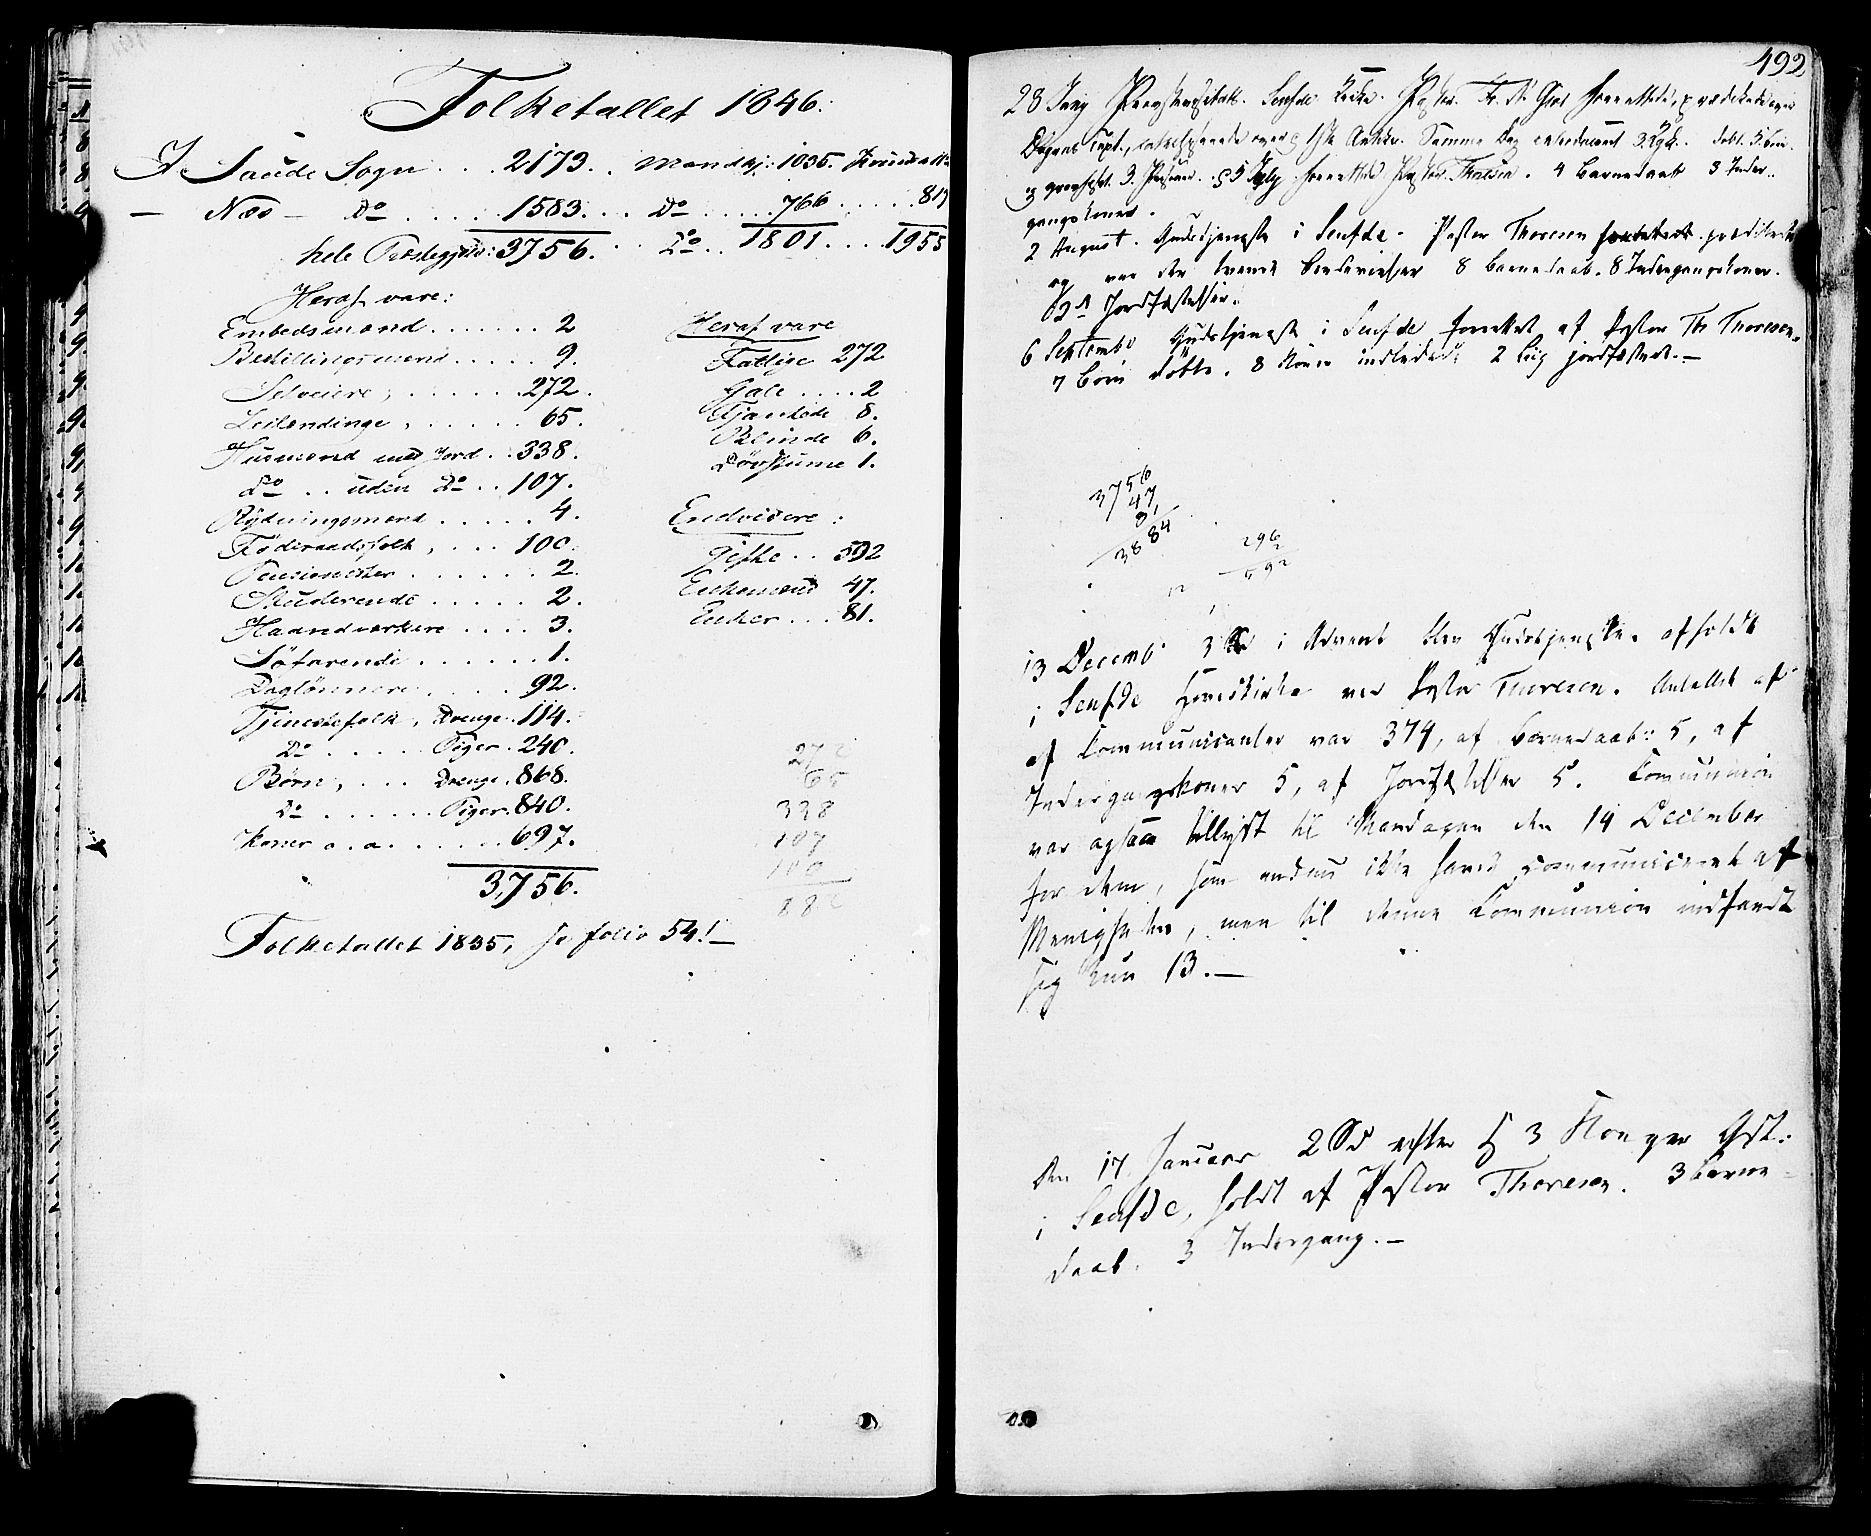 SAKO, Sauherad kirkebøker, F/Fa/L0006: Ministerialbok nr. I 6, 1827-1850, s. 492